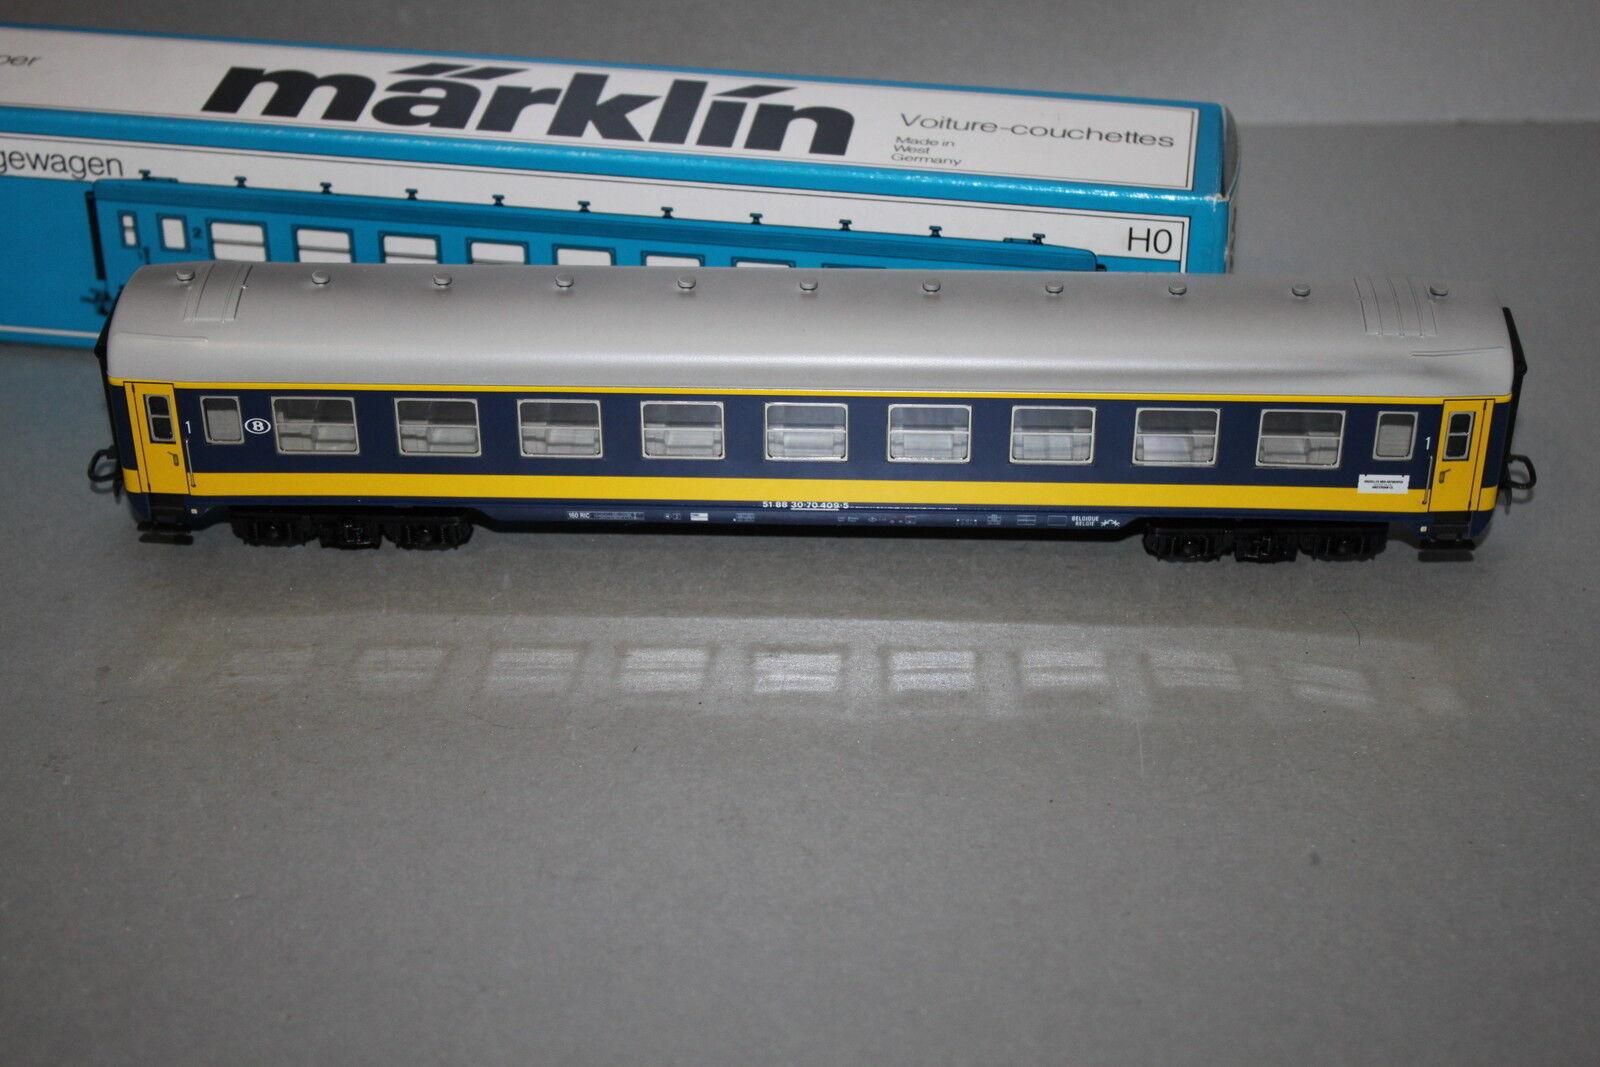 Märklin 4120 4-camion vagoni 1.kl. LETTINO Carrello Railtour SNCB traccia h0 OVP